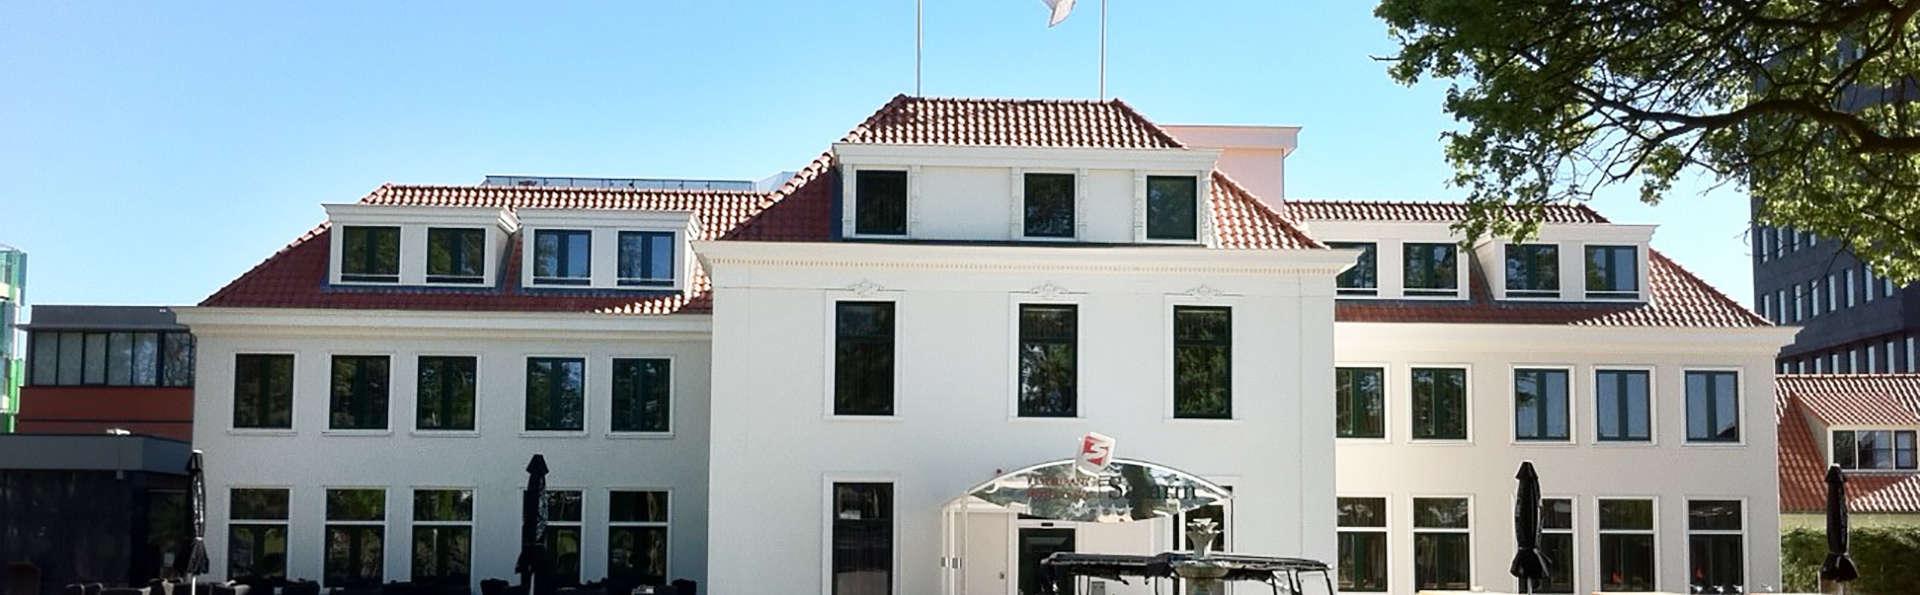 Hotel Spa Savarin Hollande